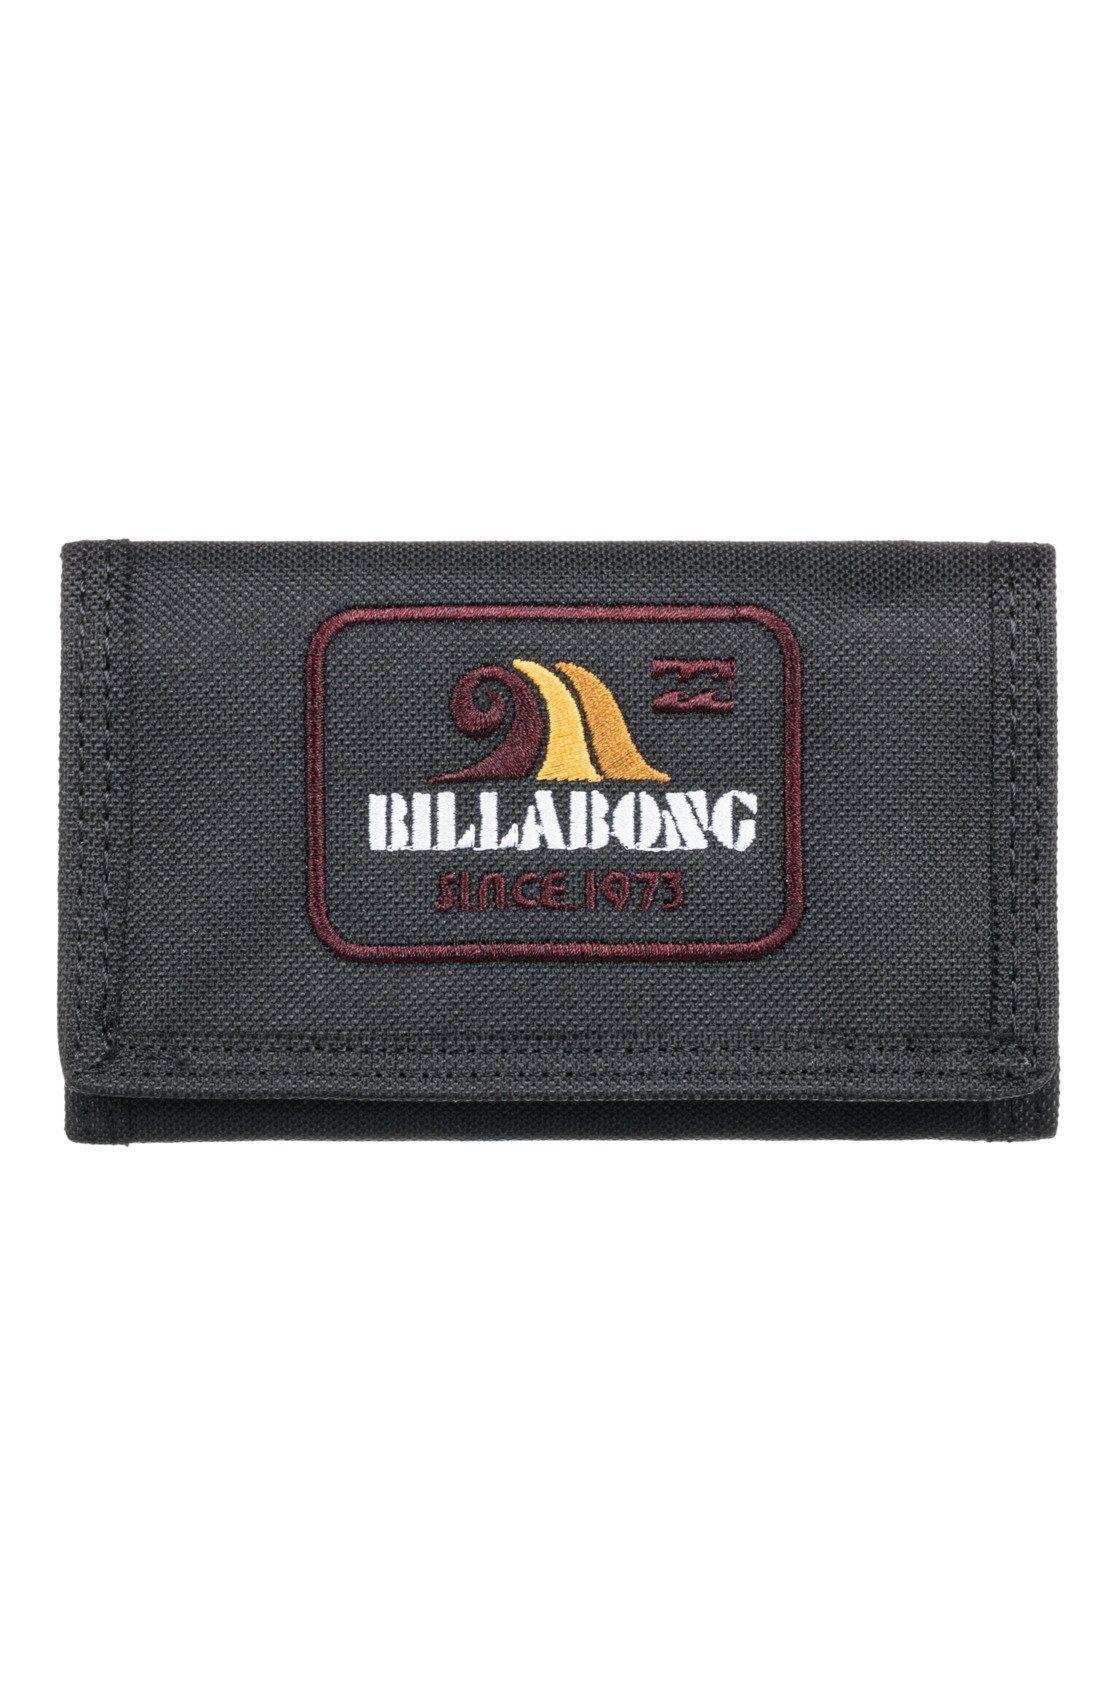 Billabong Wallet WALLED LITE Black